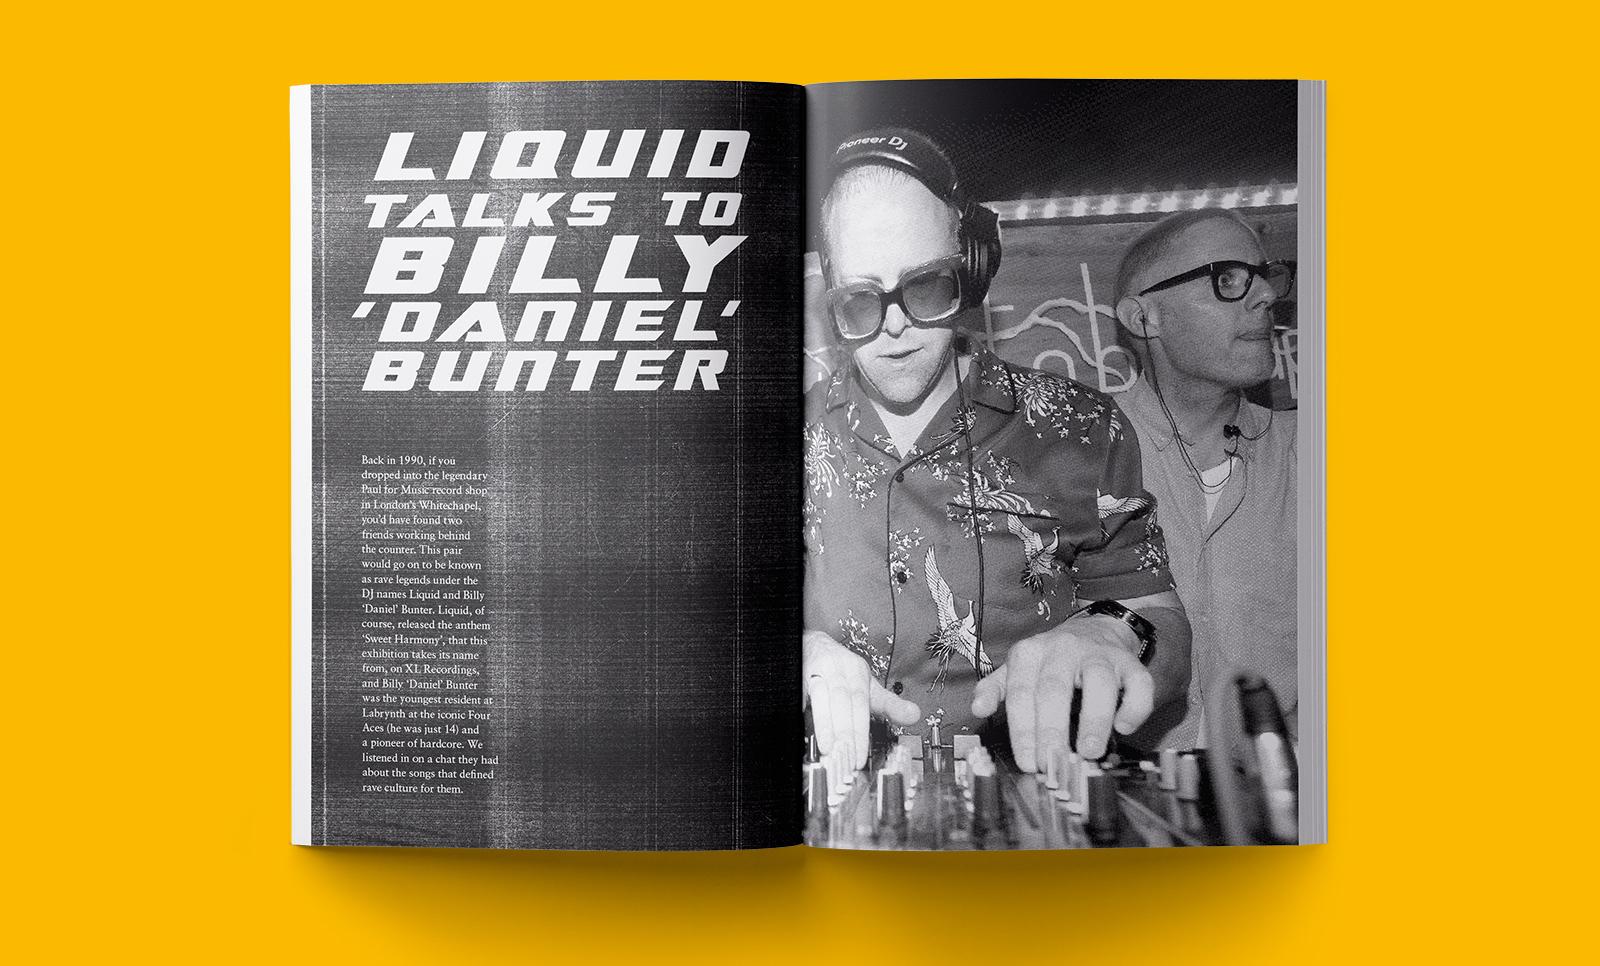 Sweet-Harmony-Saatchi-Gallery-Rave-Today-Book-Liquid-Pavement-Licker.jpg